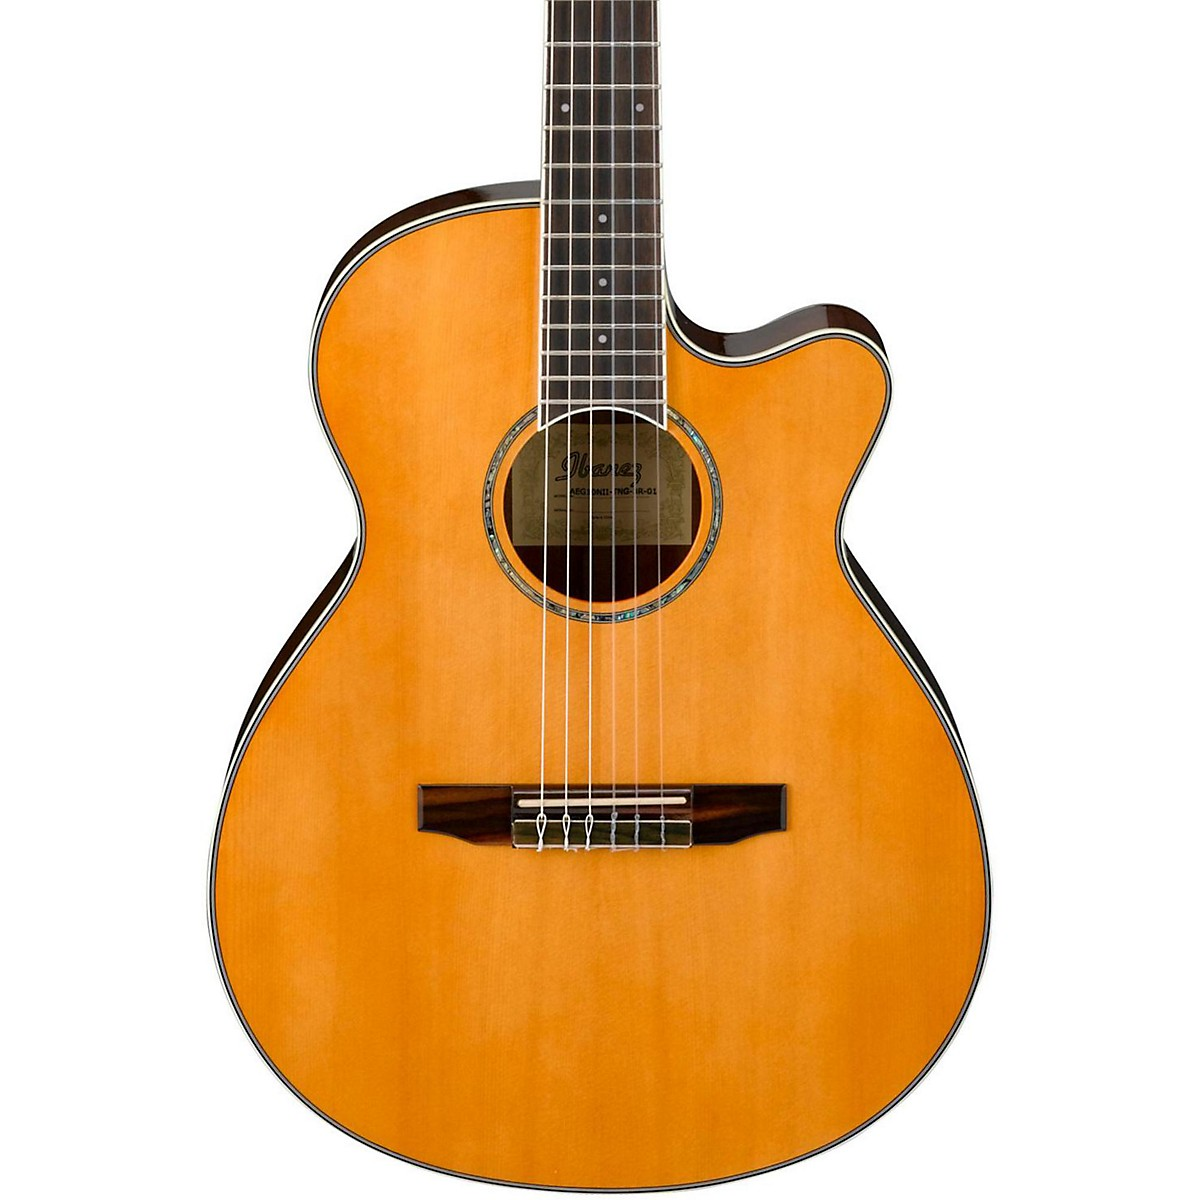 Ibanez AEG10NII Nylon String Cutaway Acoustic-Electric Guitar